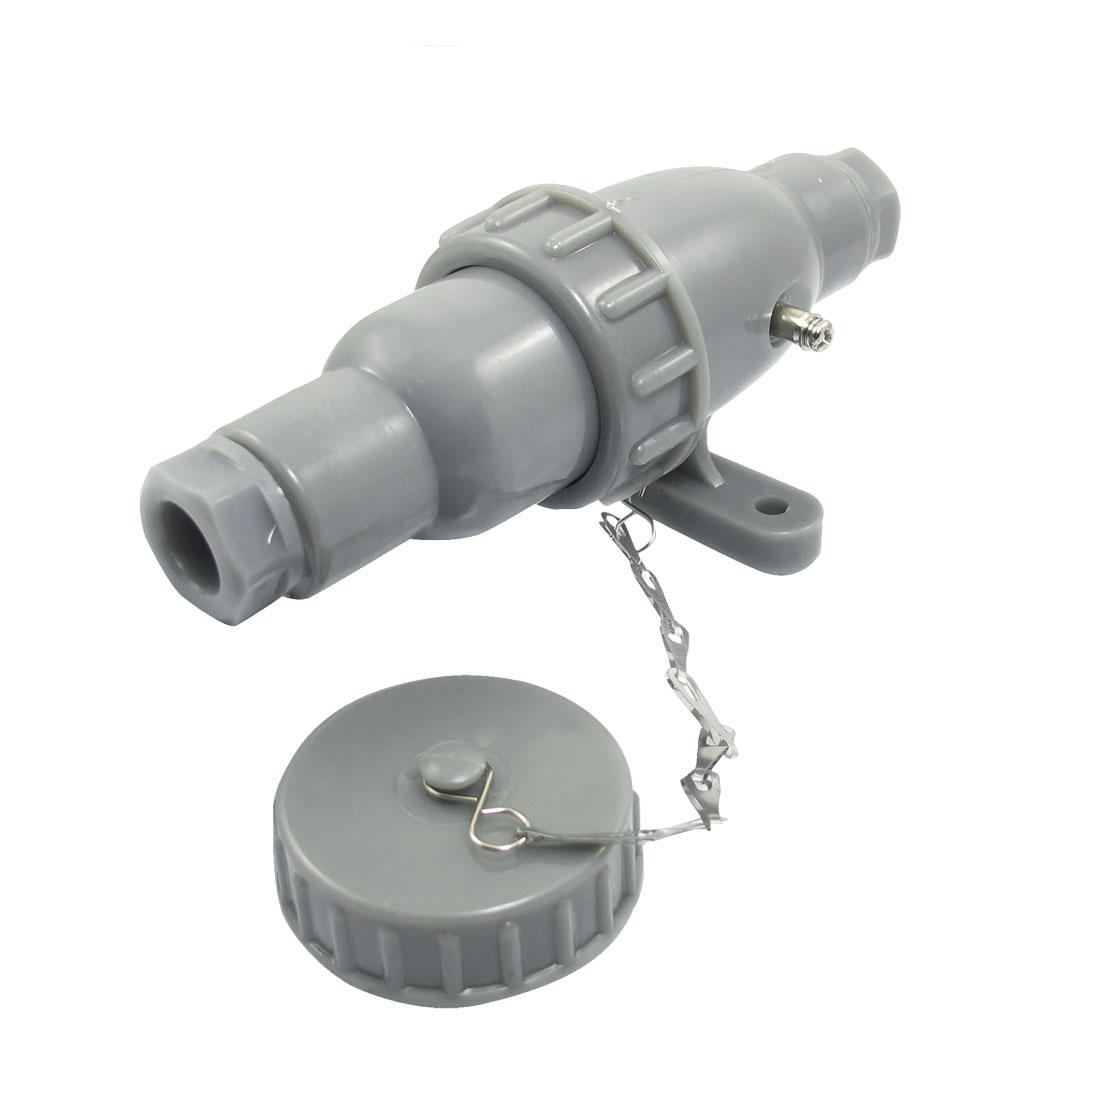 500VAC 10A 3P+E Gray Waterproof Marine Plug Socket Set Junction CTF3-2/CZF3-2